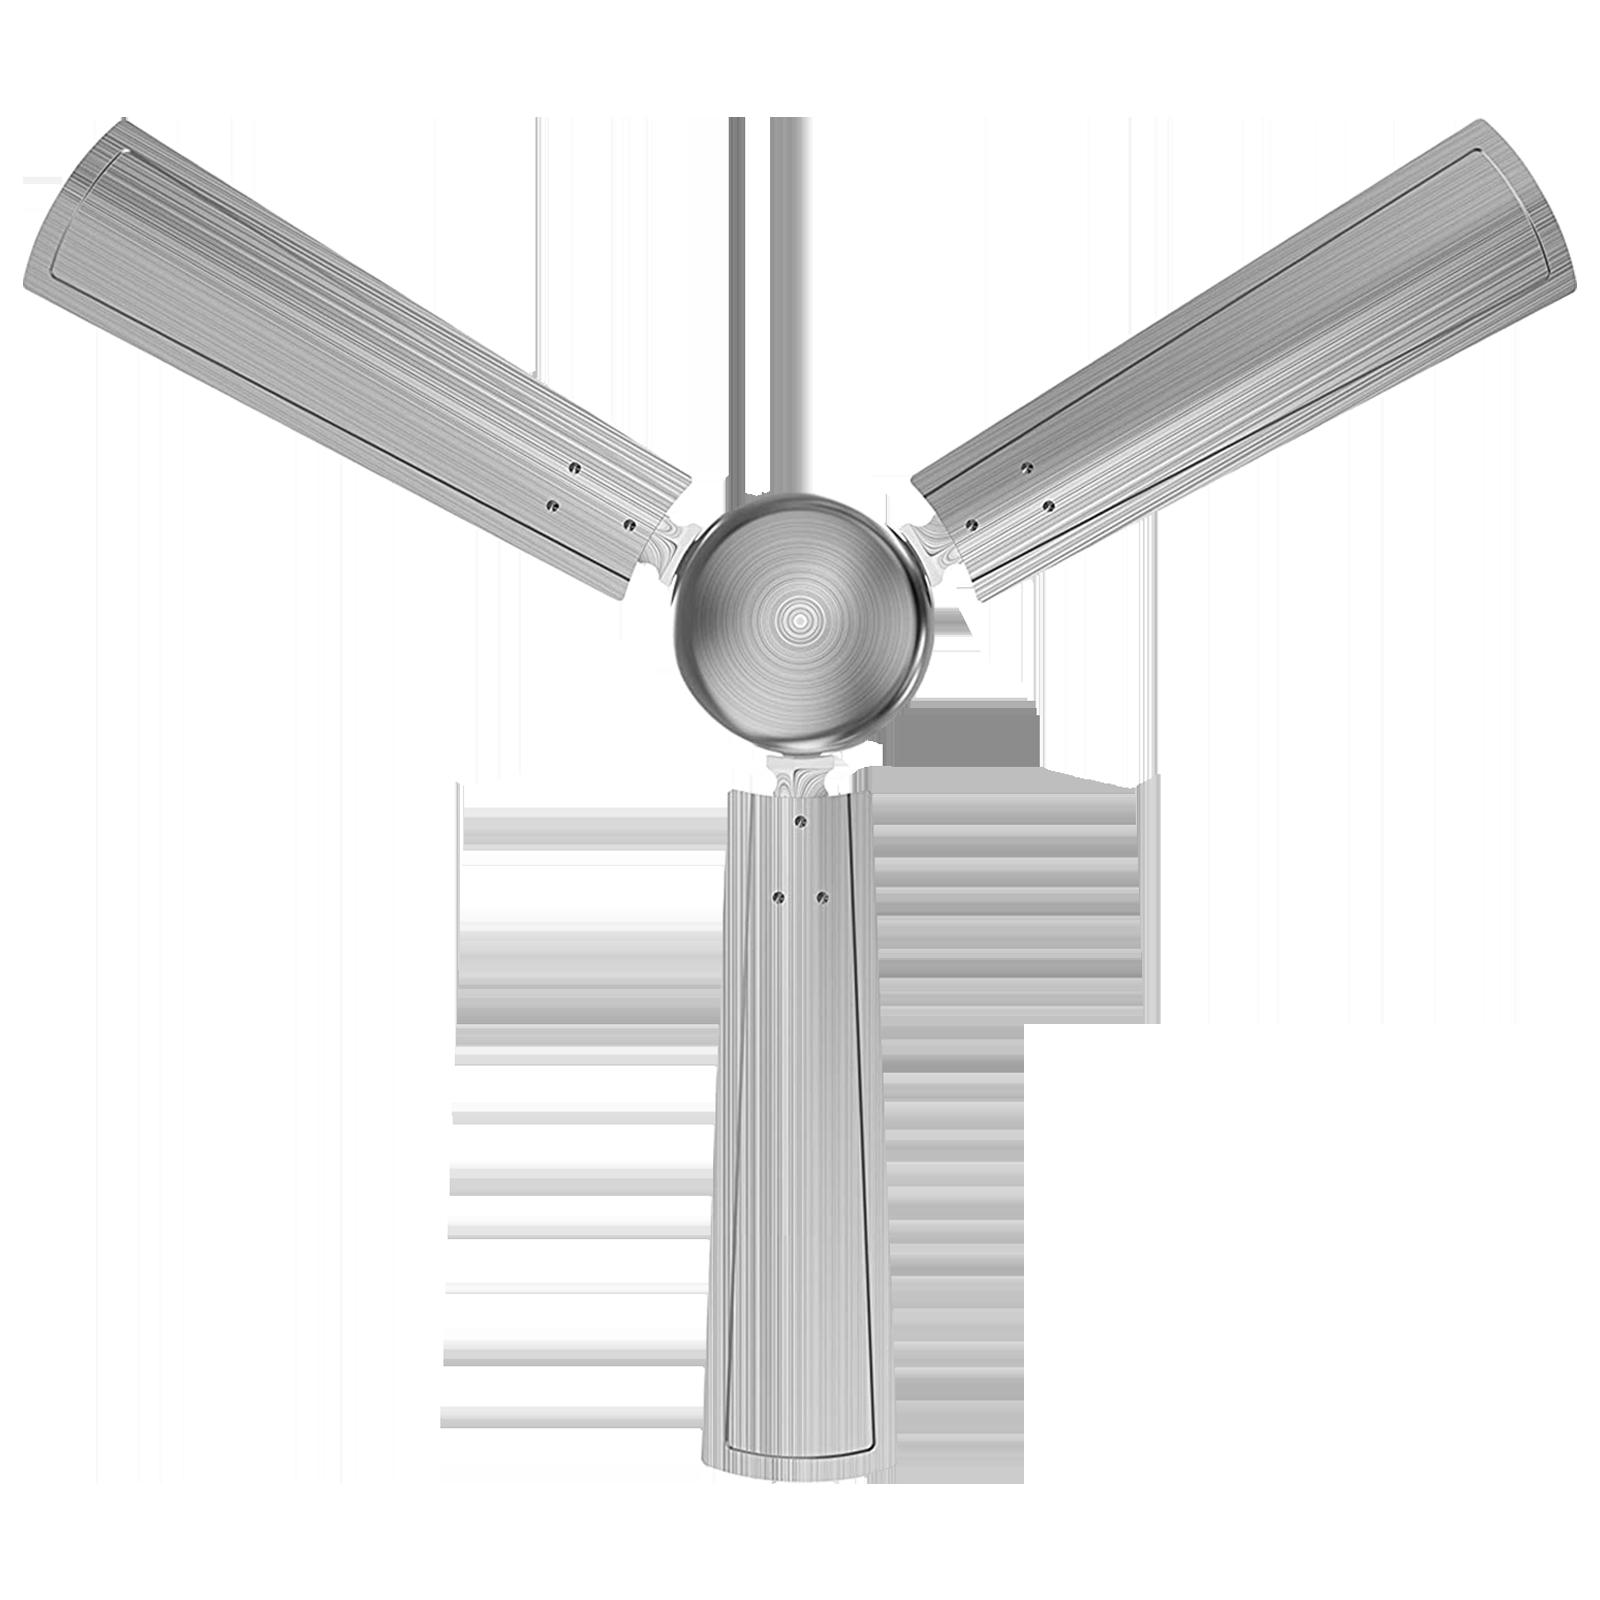 GM Spencer 120 cm Sweep 3 Blade Ceiling Fan (Aerodynamically Designed Blades, CFP480012BSEP, Silver)_1